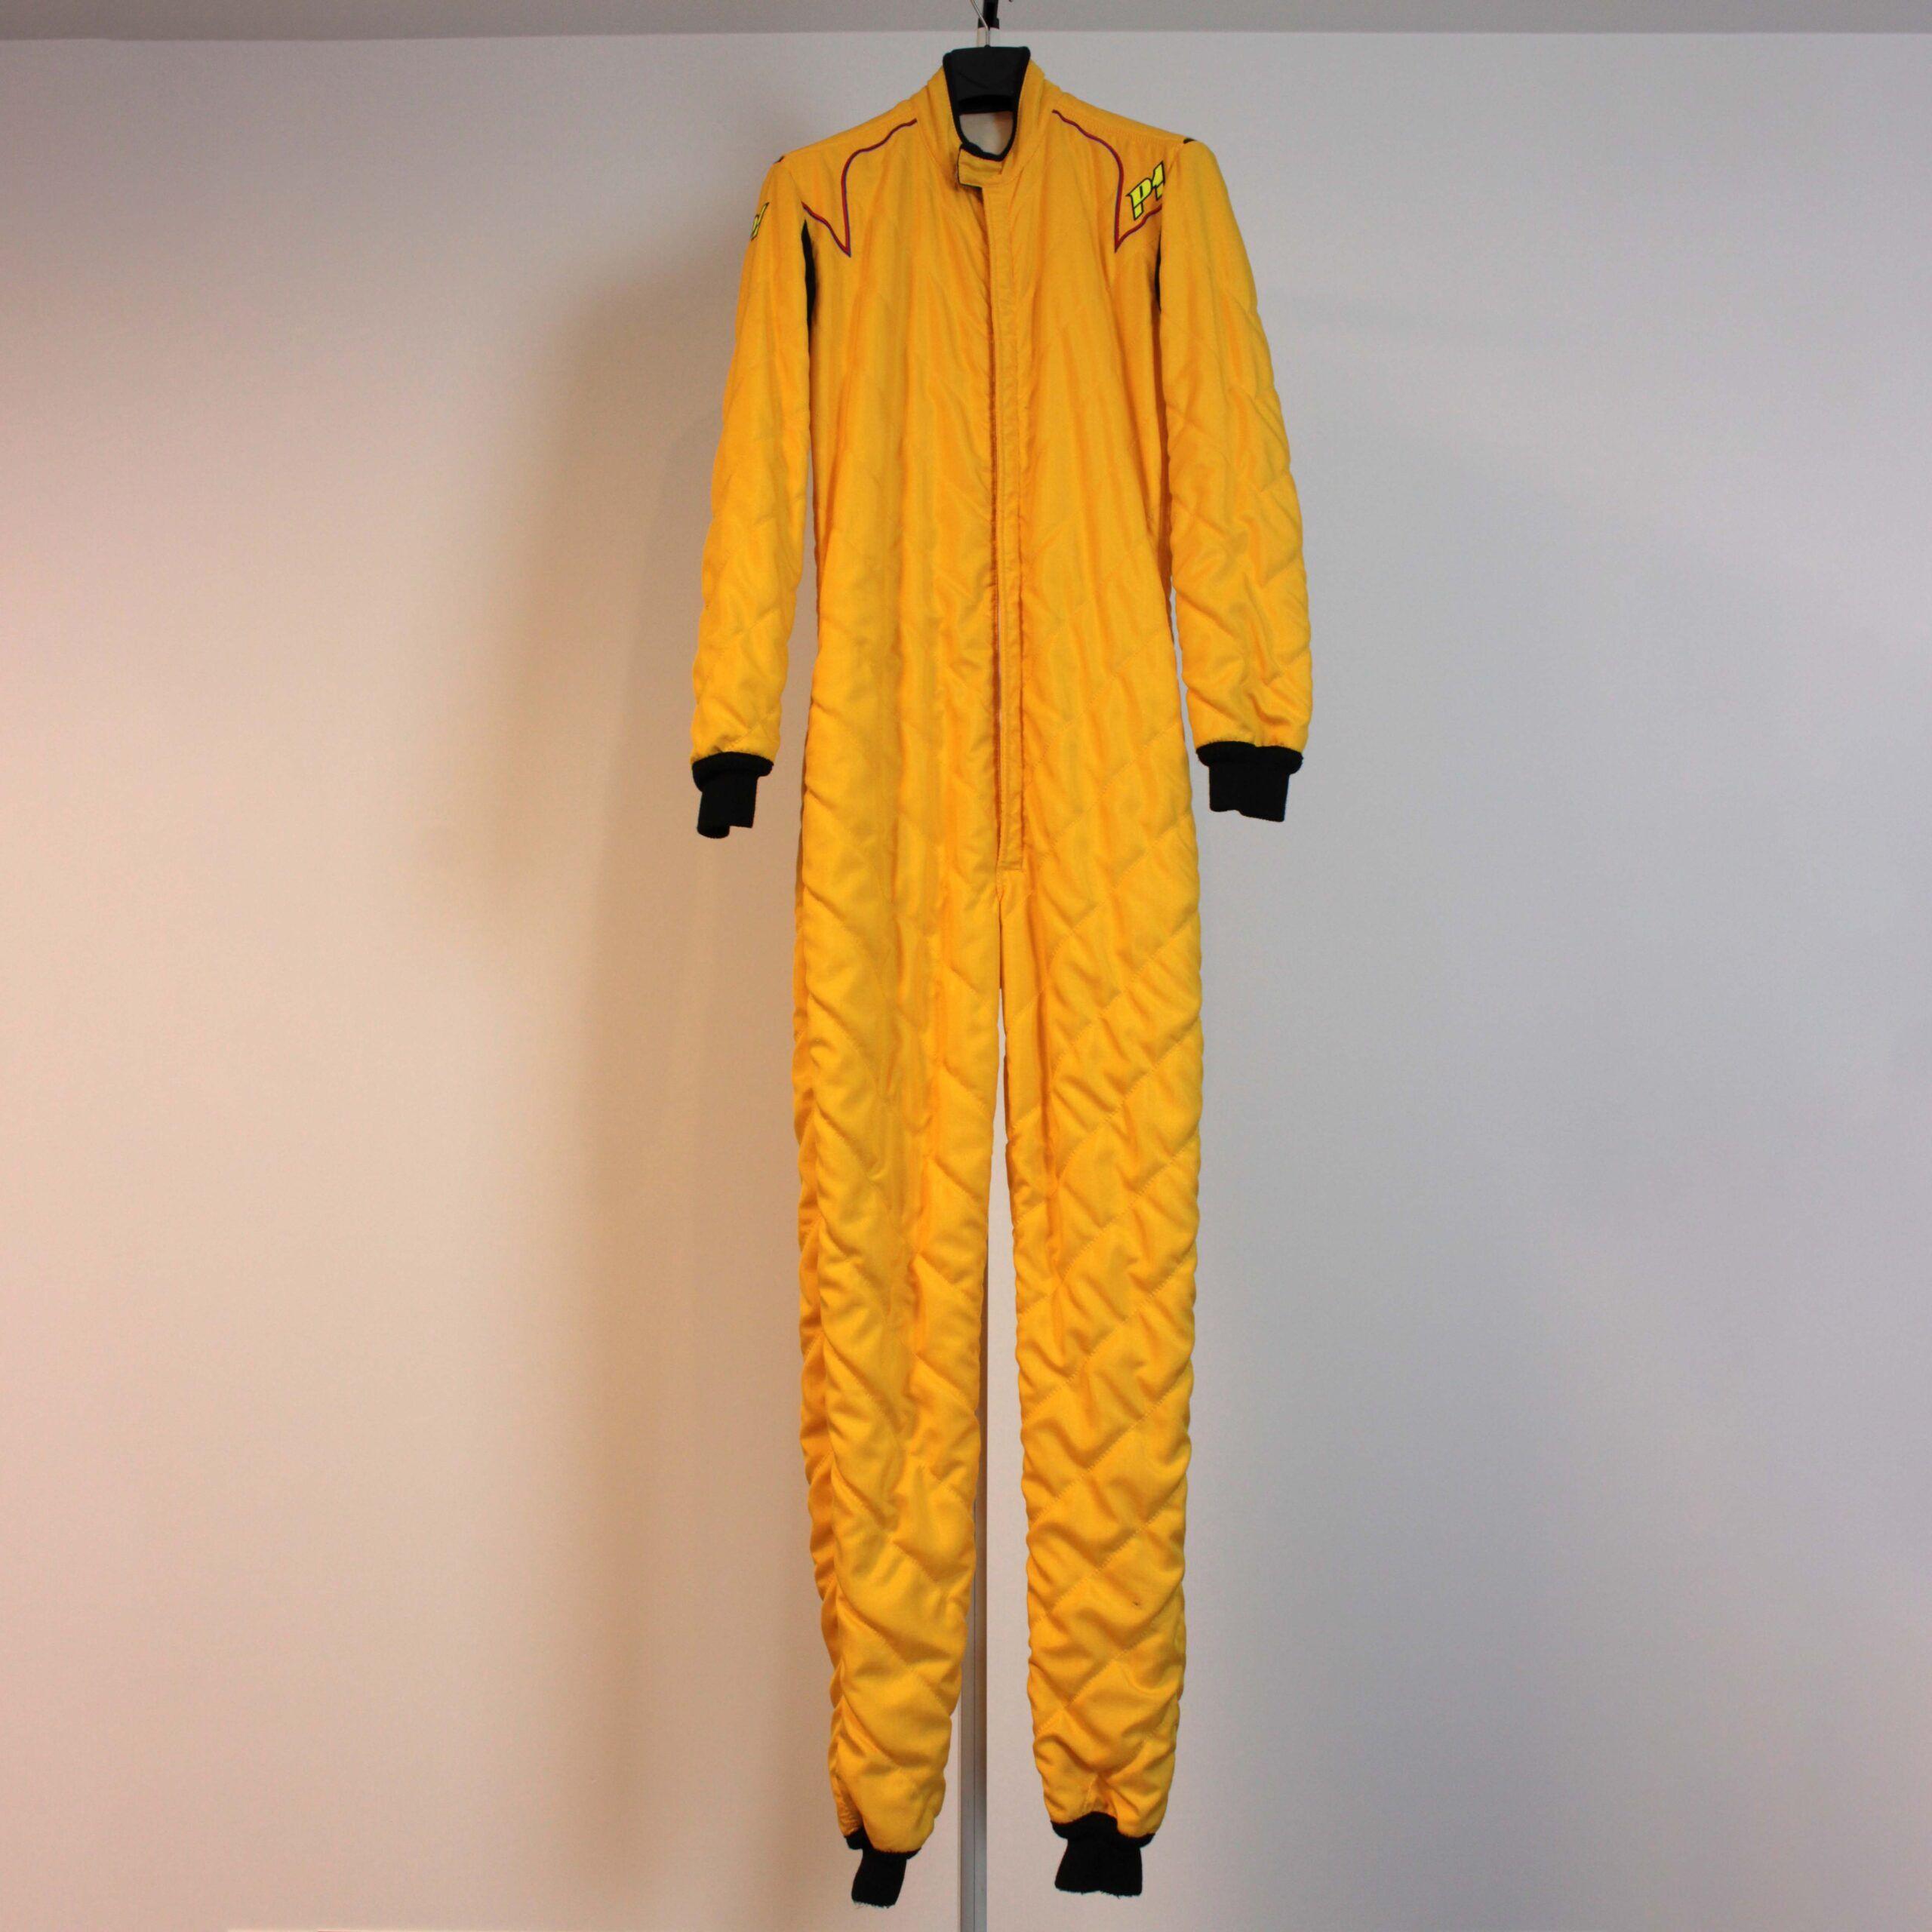 P1 Racewear FORMULA FIA gekeurd overall - Yellow